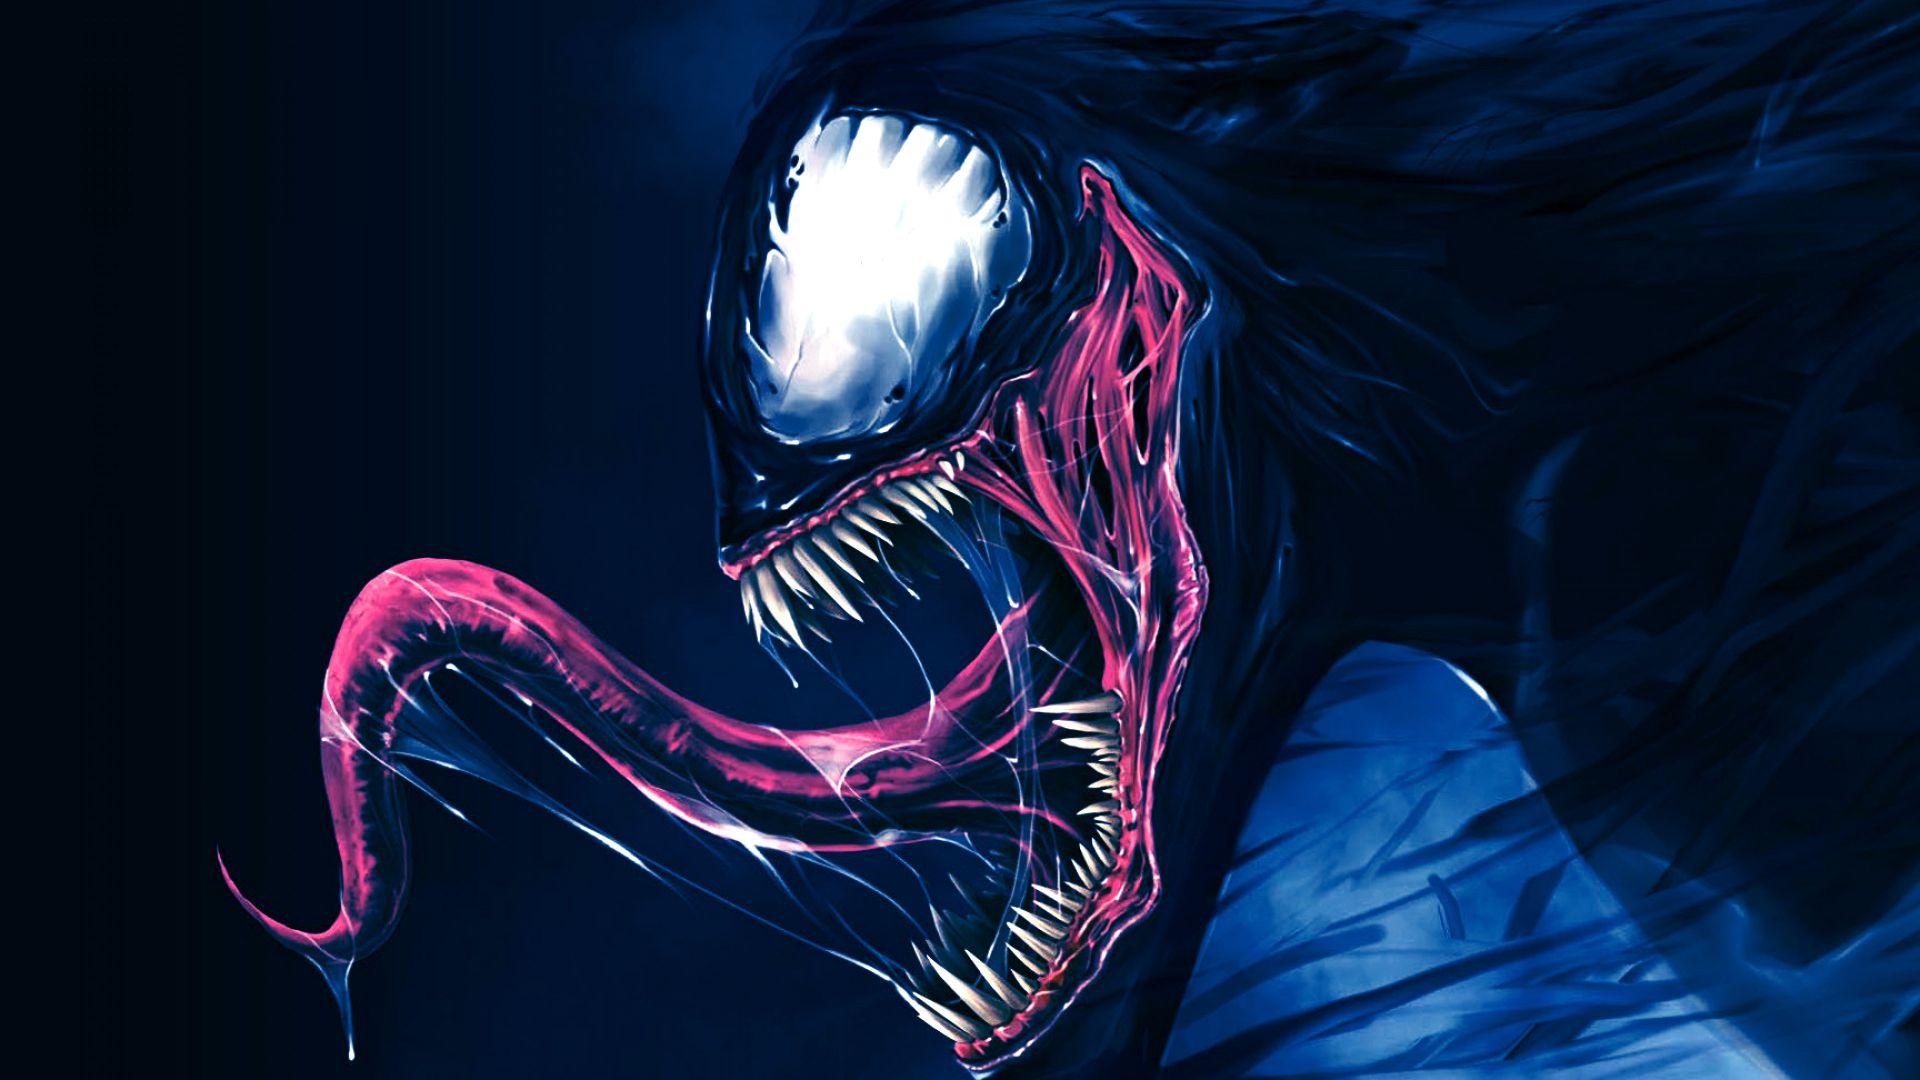 Wallpaper Venom, 4K, Movies #18038